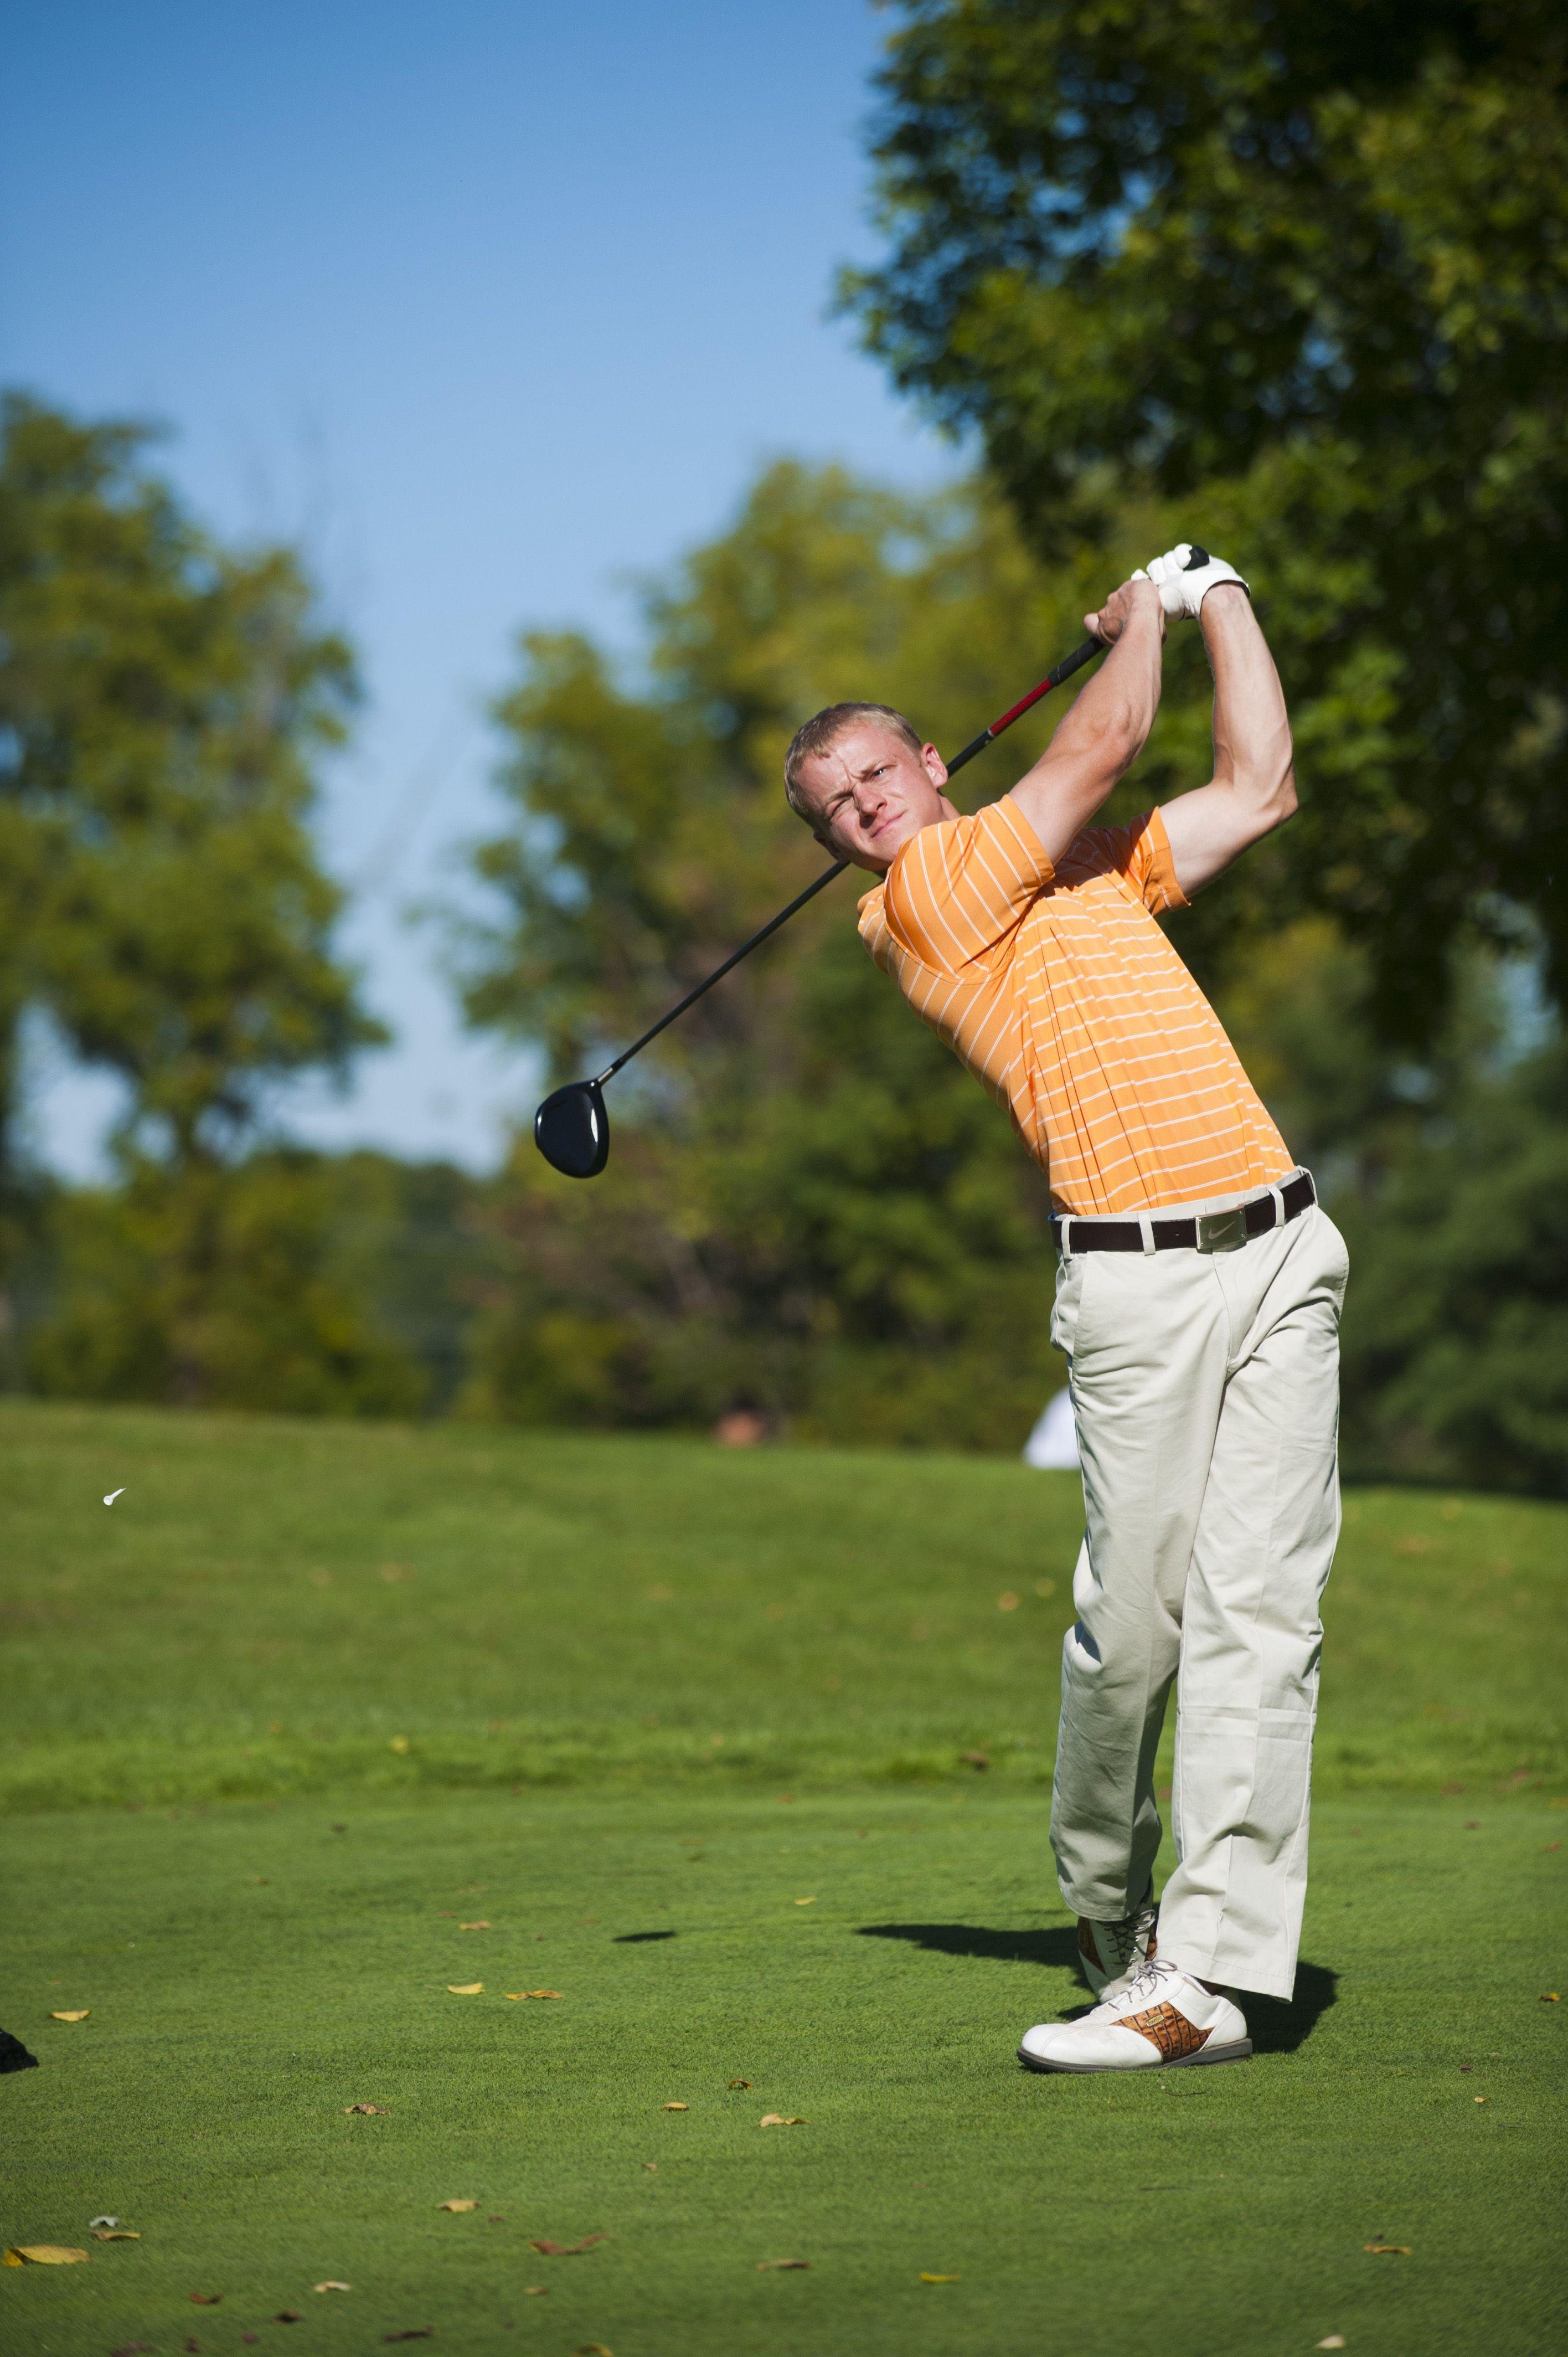 southern mens golf lands - 736×1106